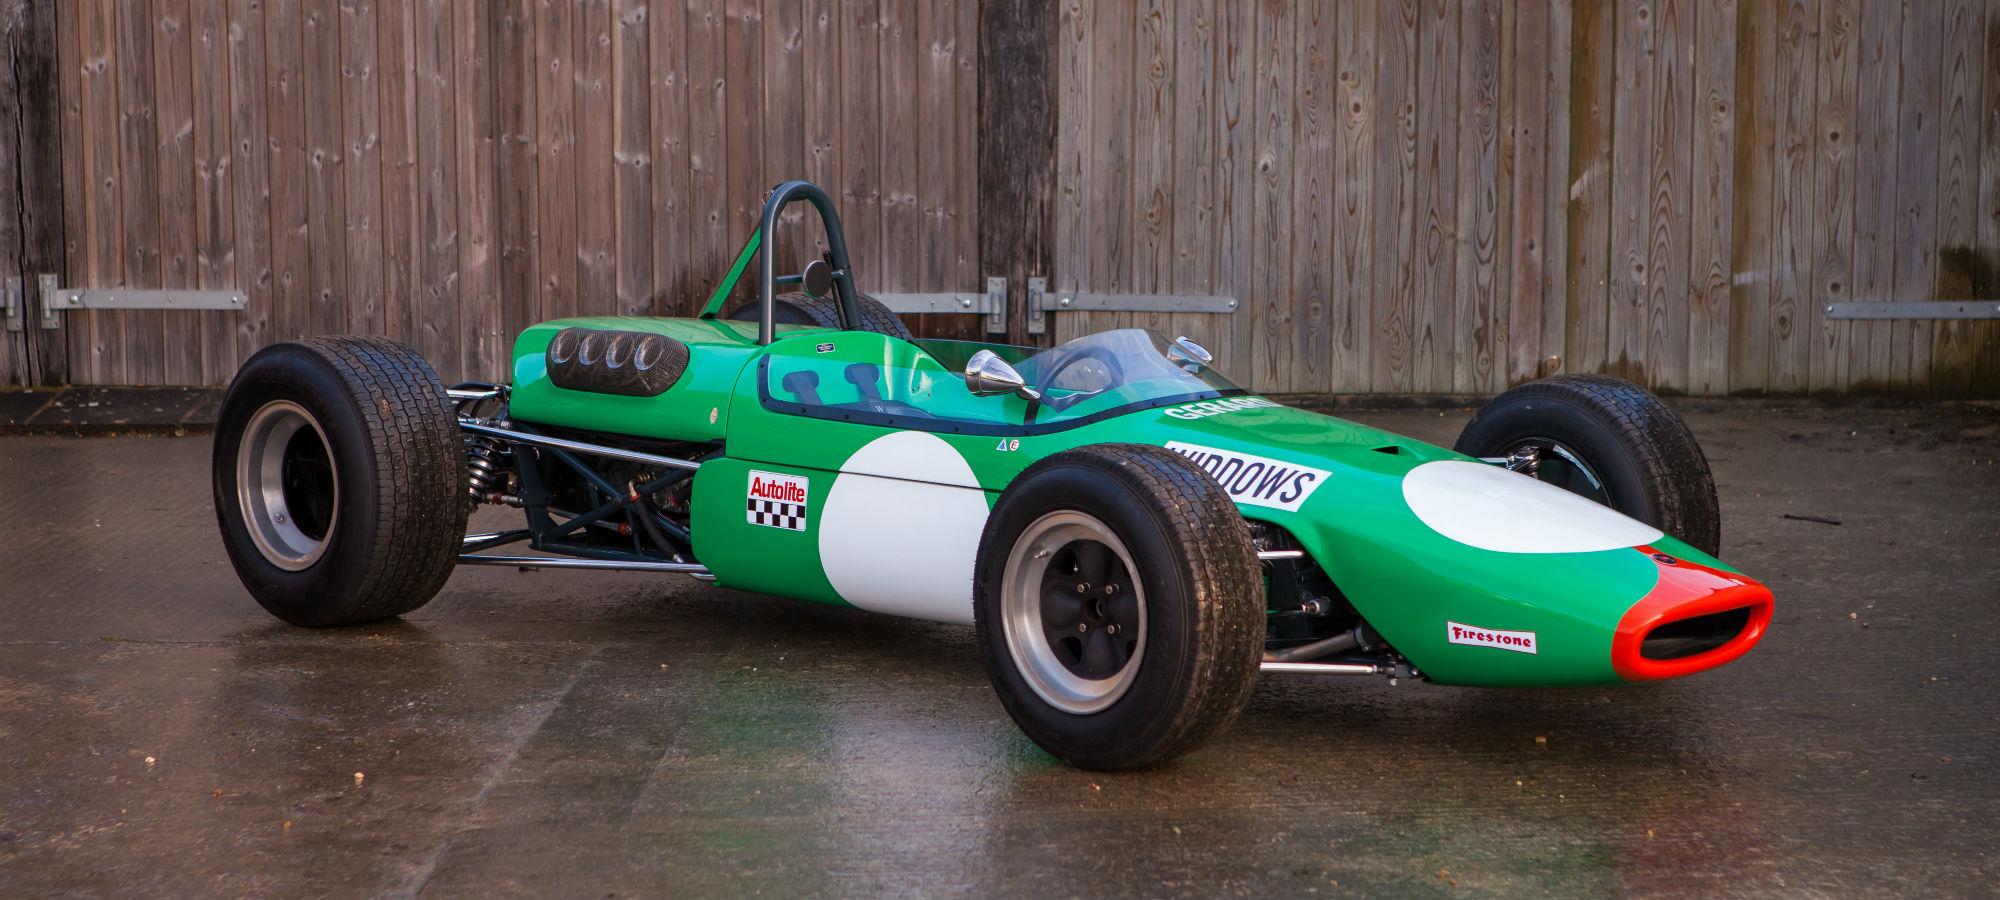 The Ex - Bob Gerard Racing, Robin Widdows, Brian Hart, Multiple Race Winning 1968 Brabham BT23C Formula 2